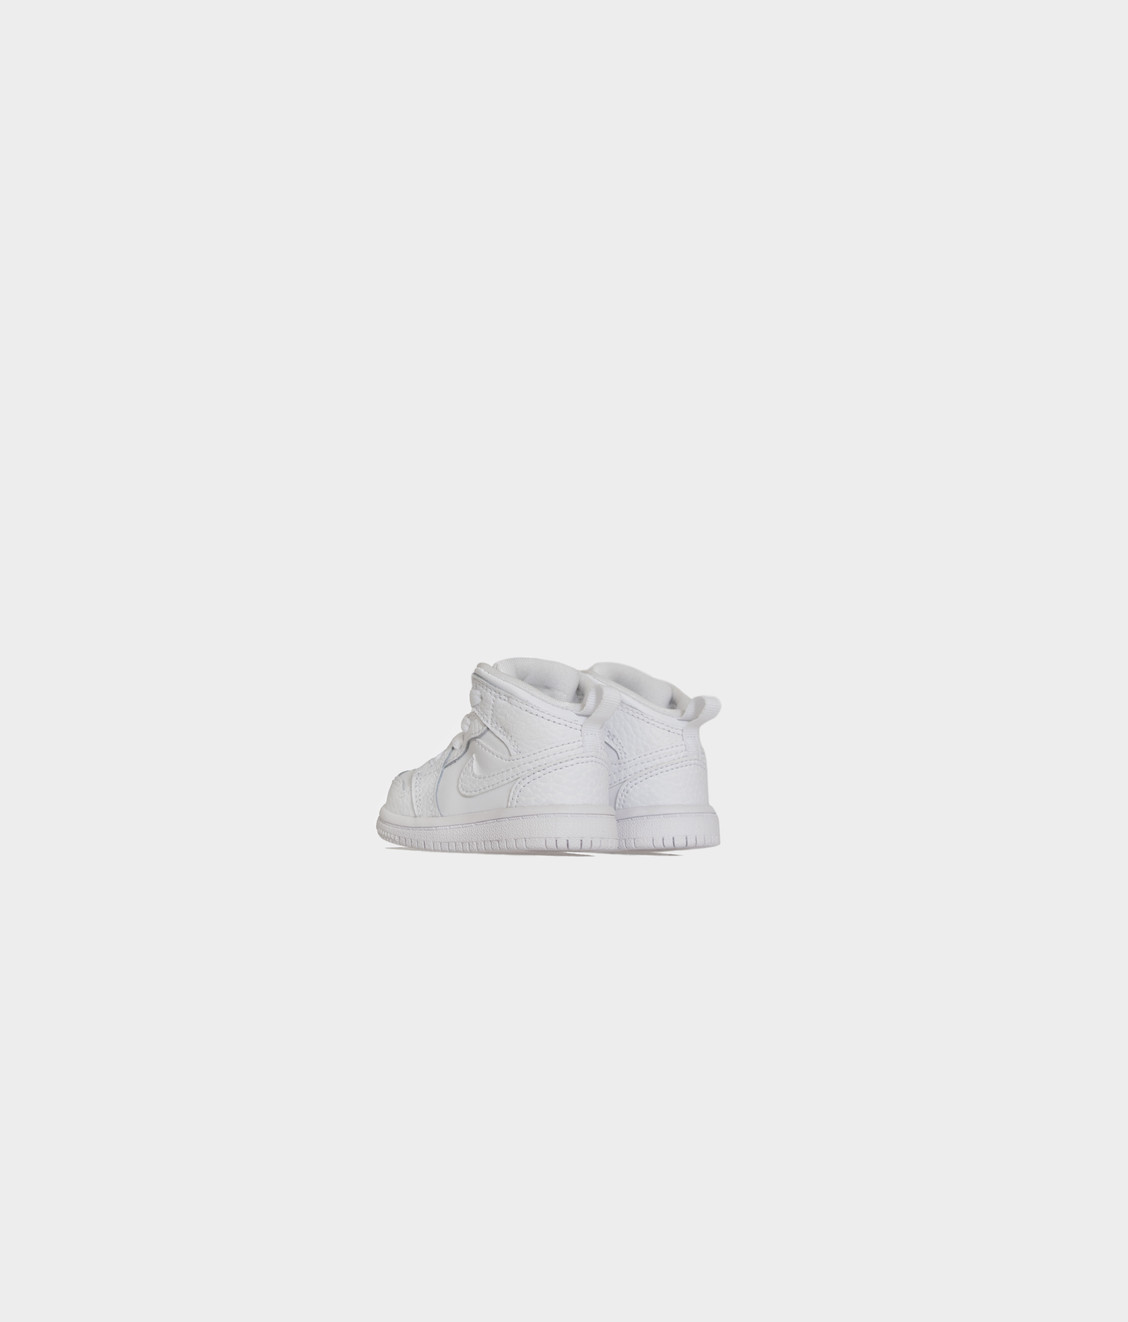 Nike Nike Jordan 1 Mid TD White